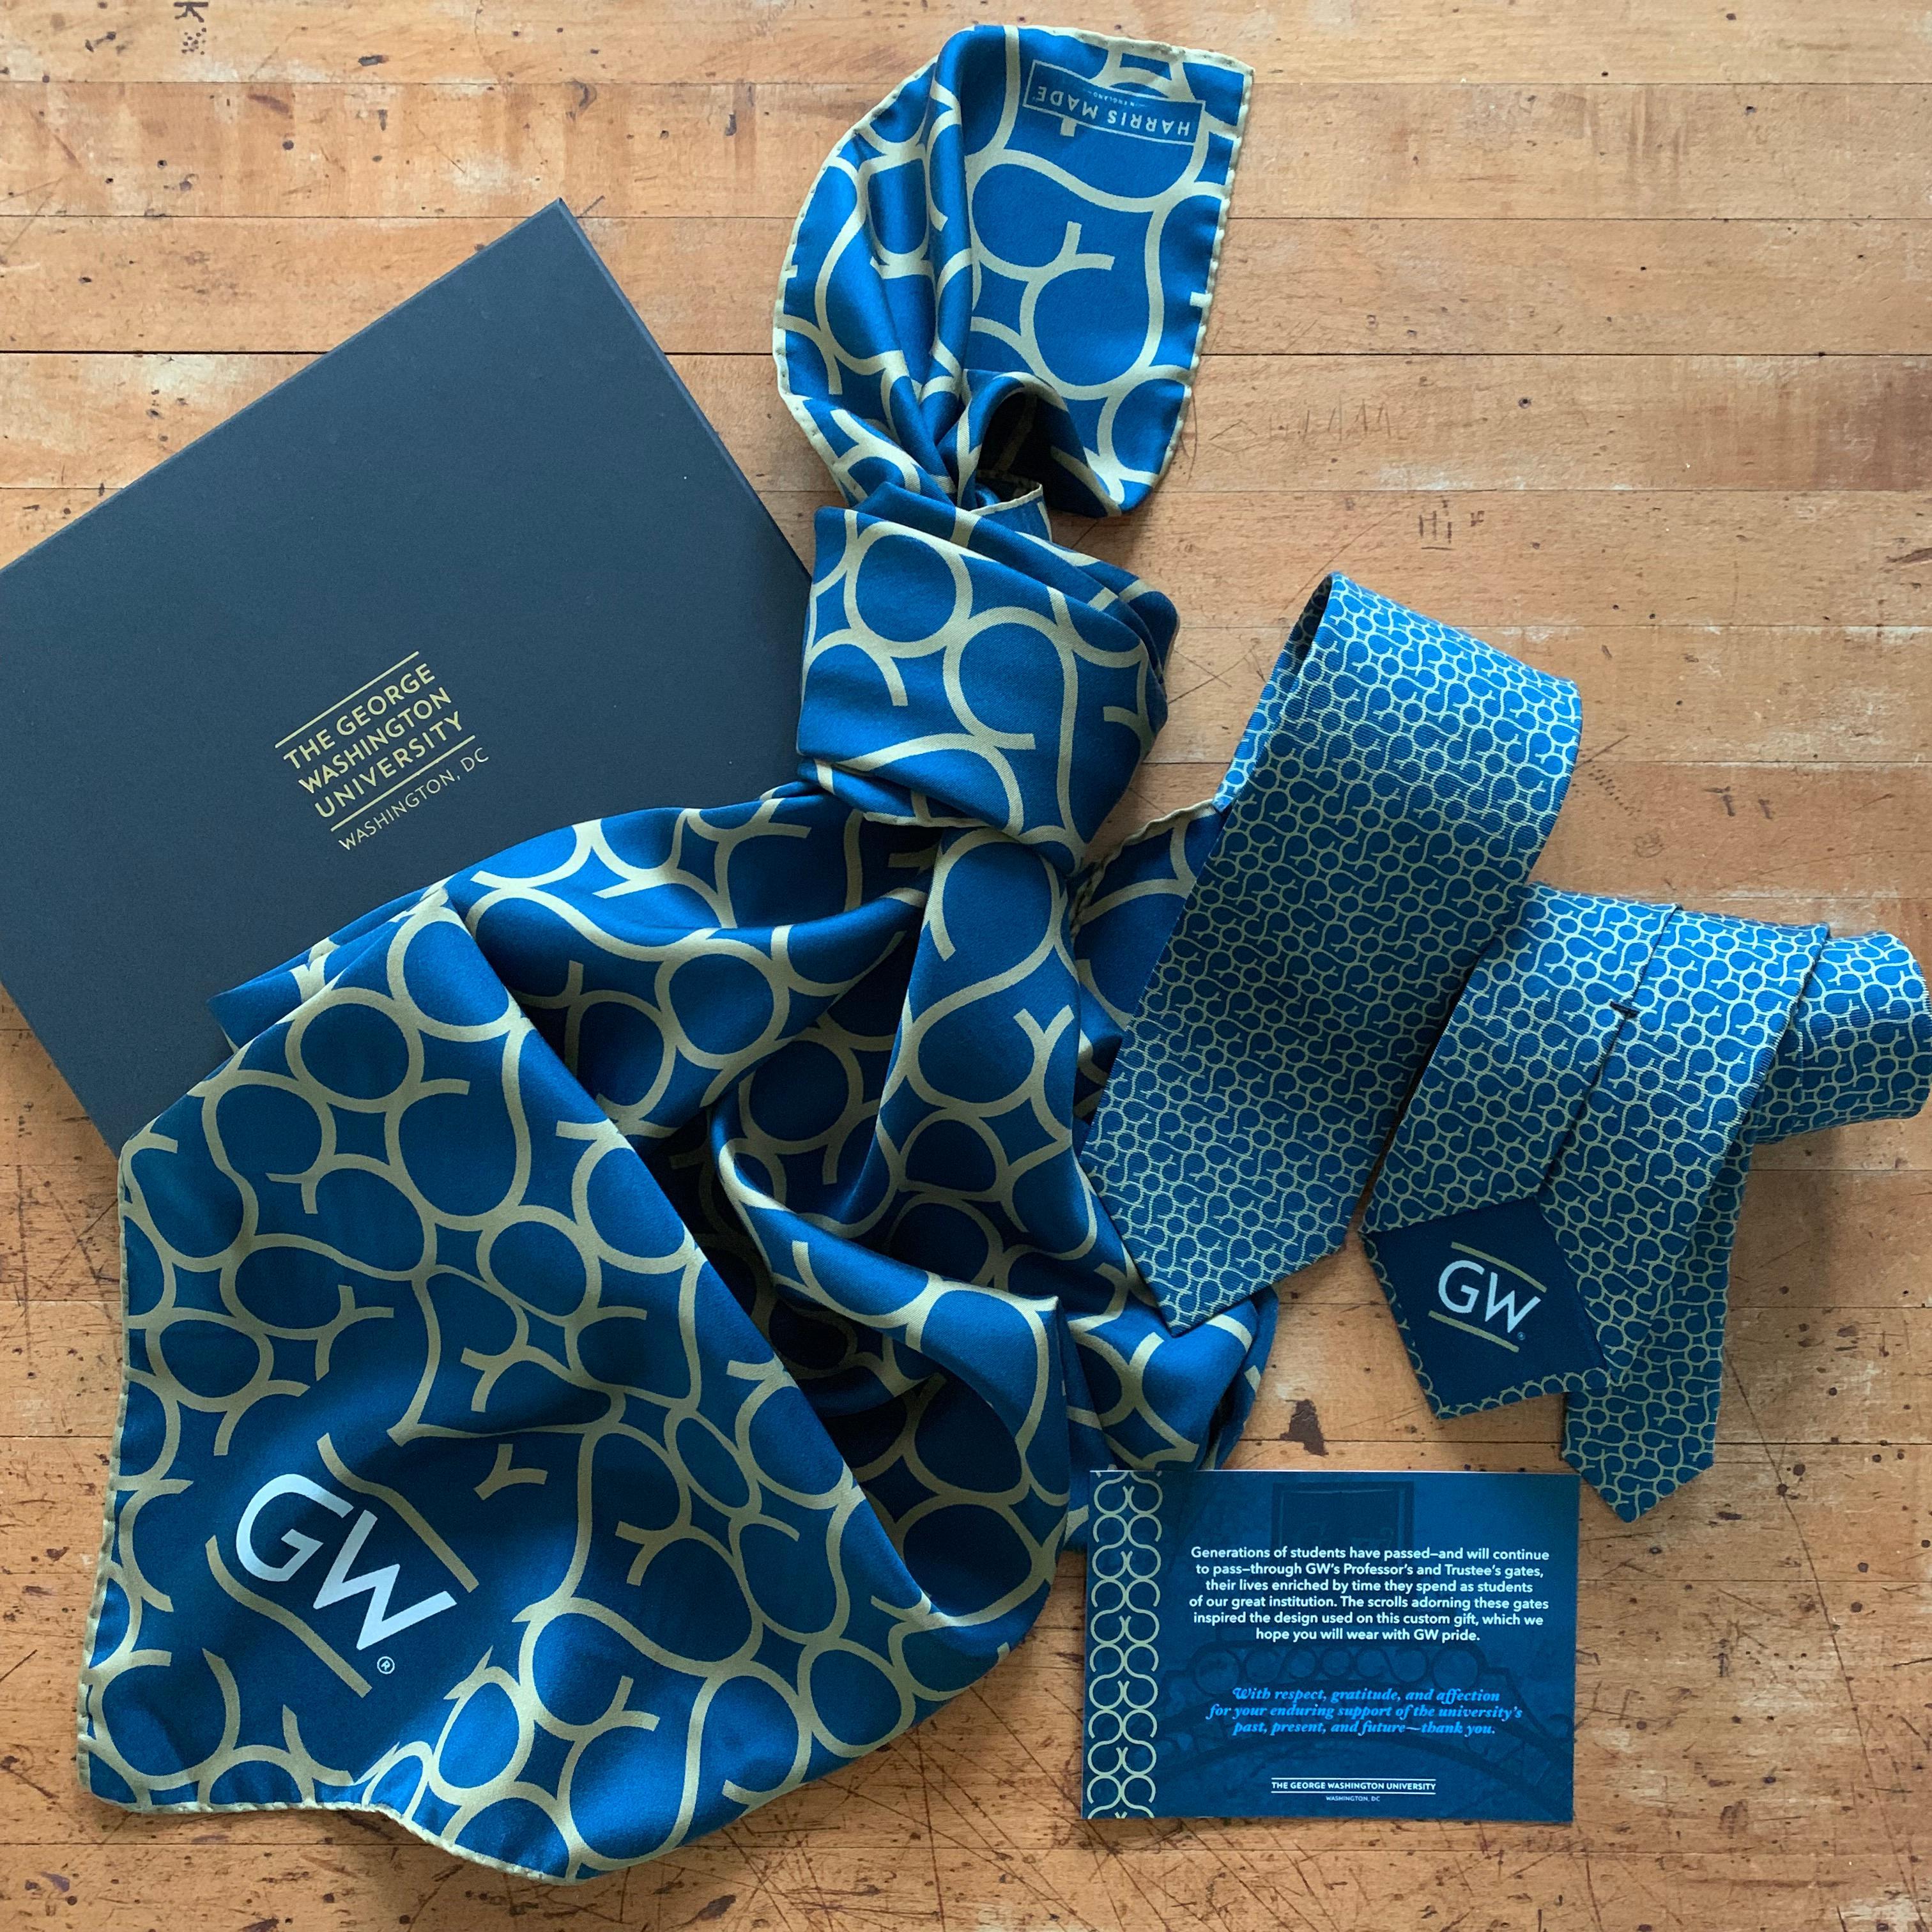 customer silk scarf for george washington university